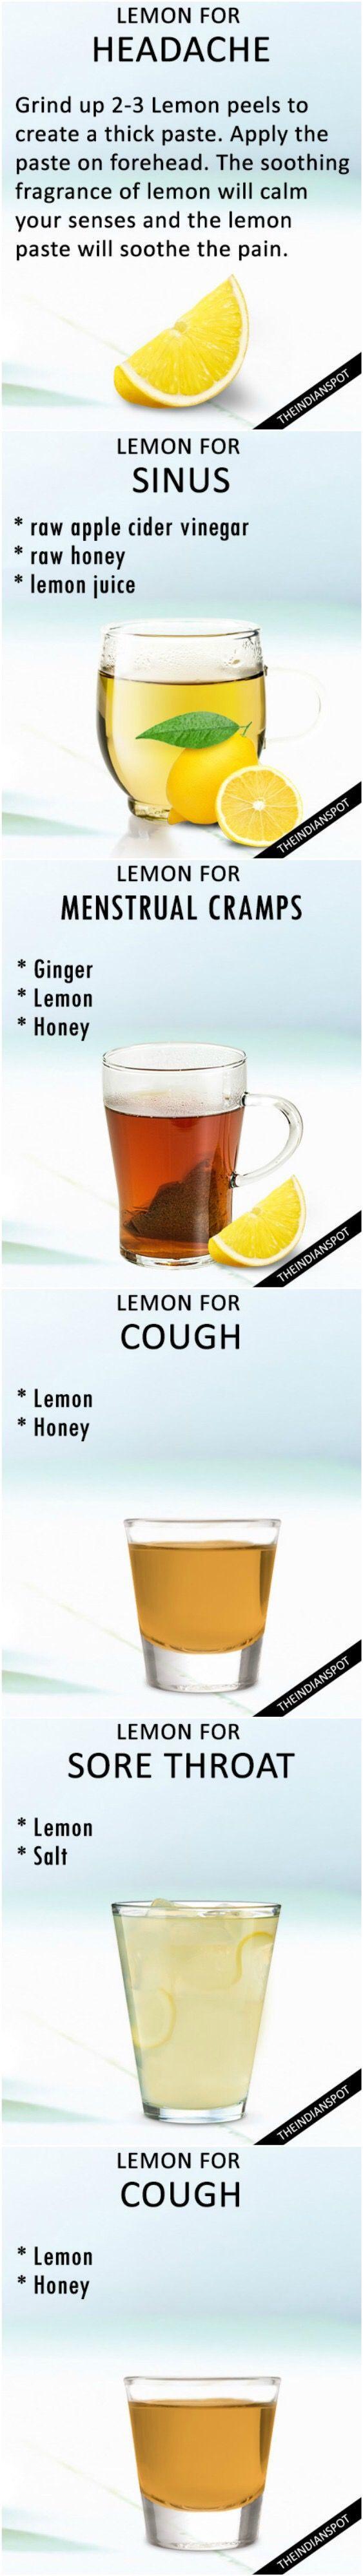 Lemon remedies #nutritiontips,